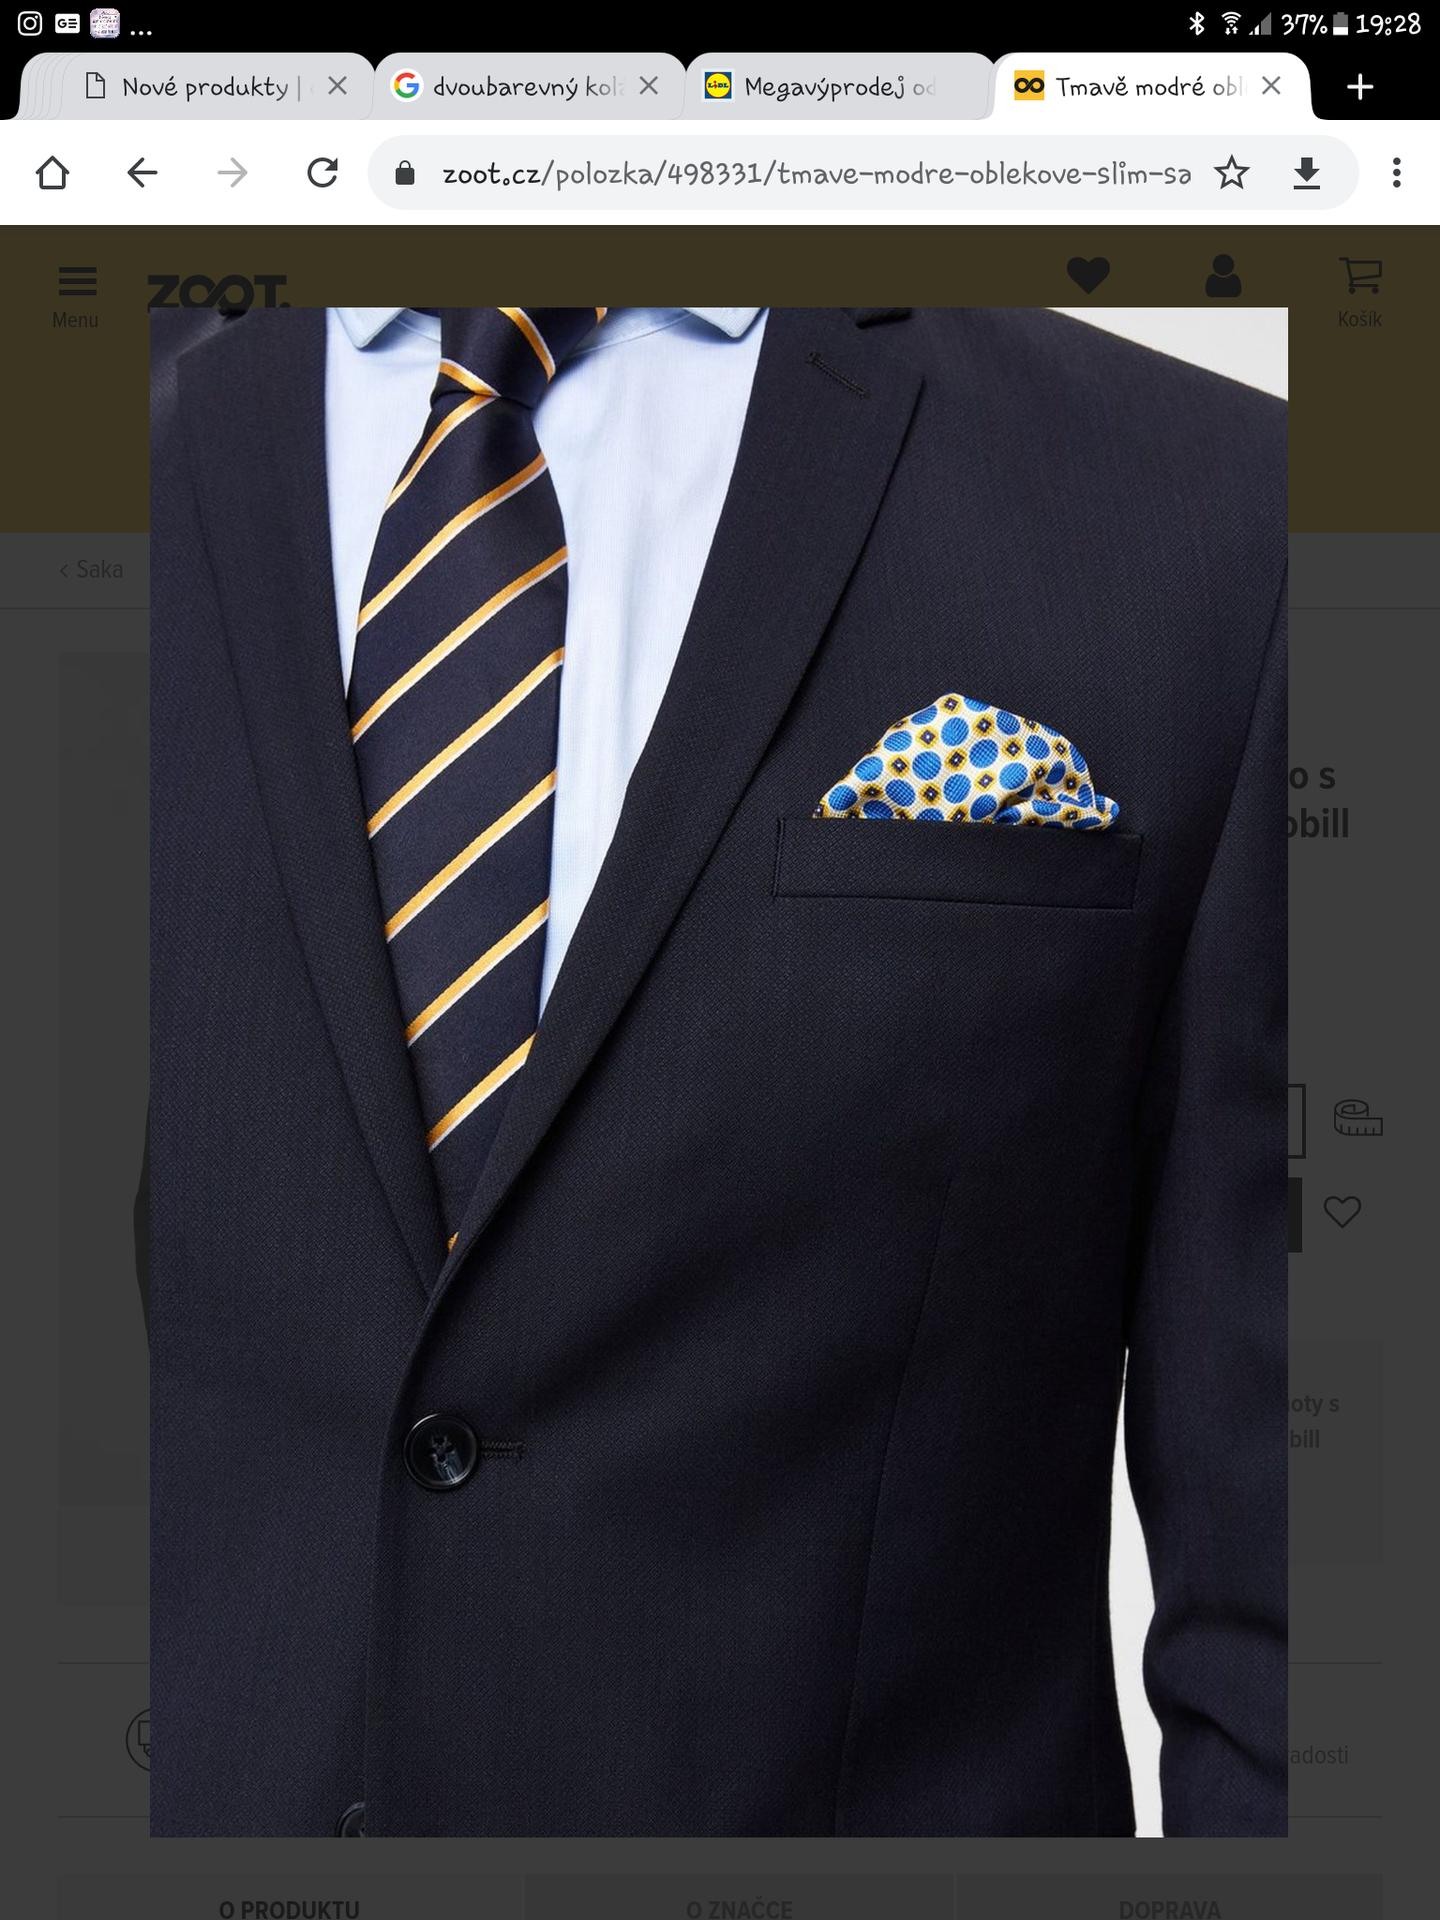 Vrabcovi 10.9.2022 - detail obleku